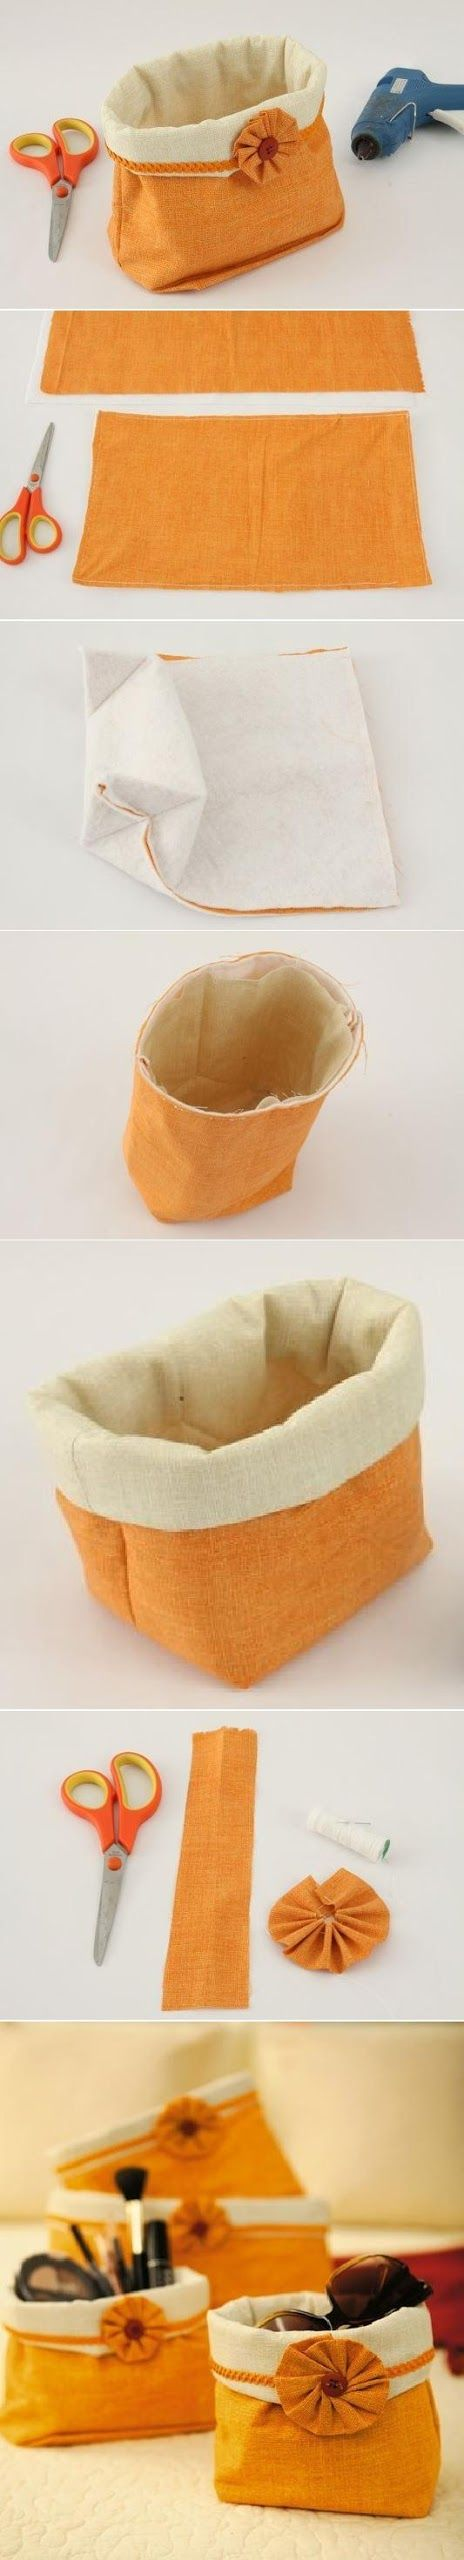 How To Make a Charming Handbag